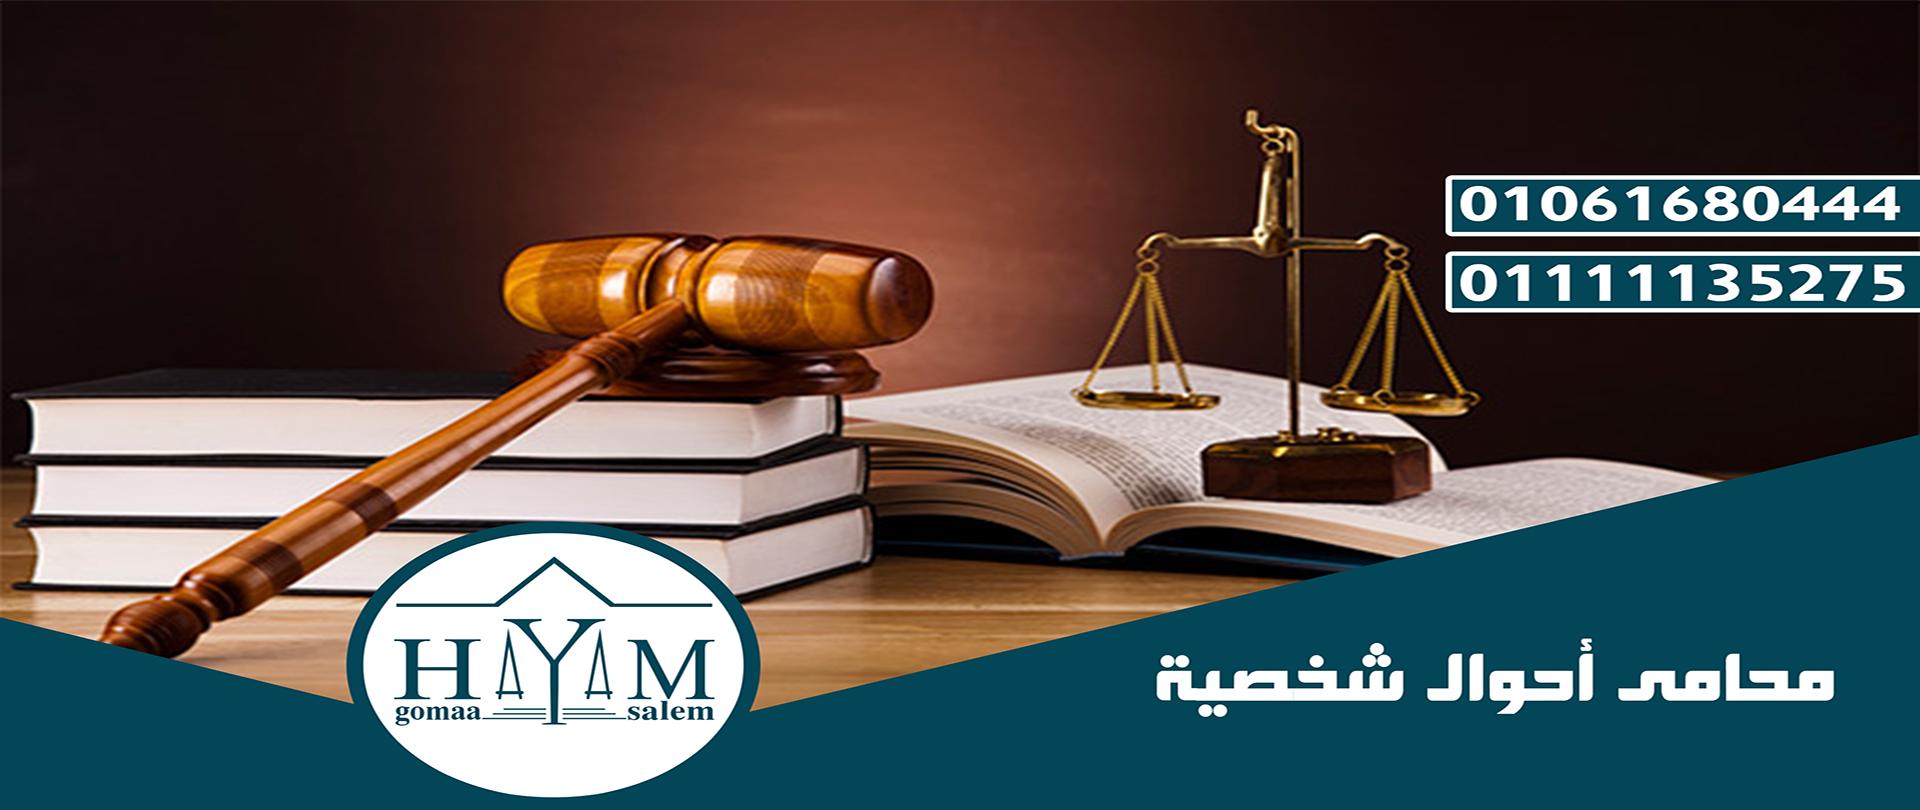 محامى-احوال-شخصية-copy